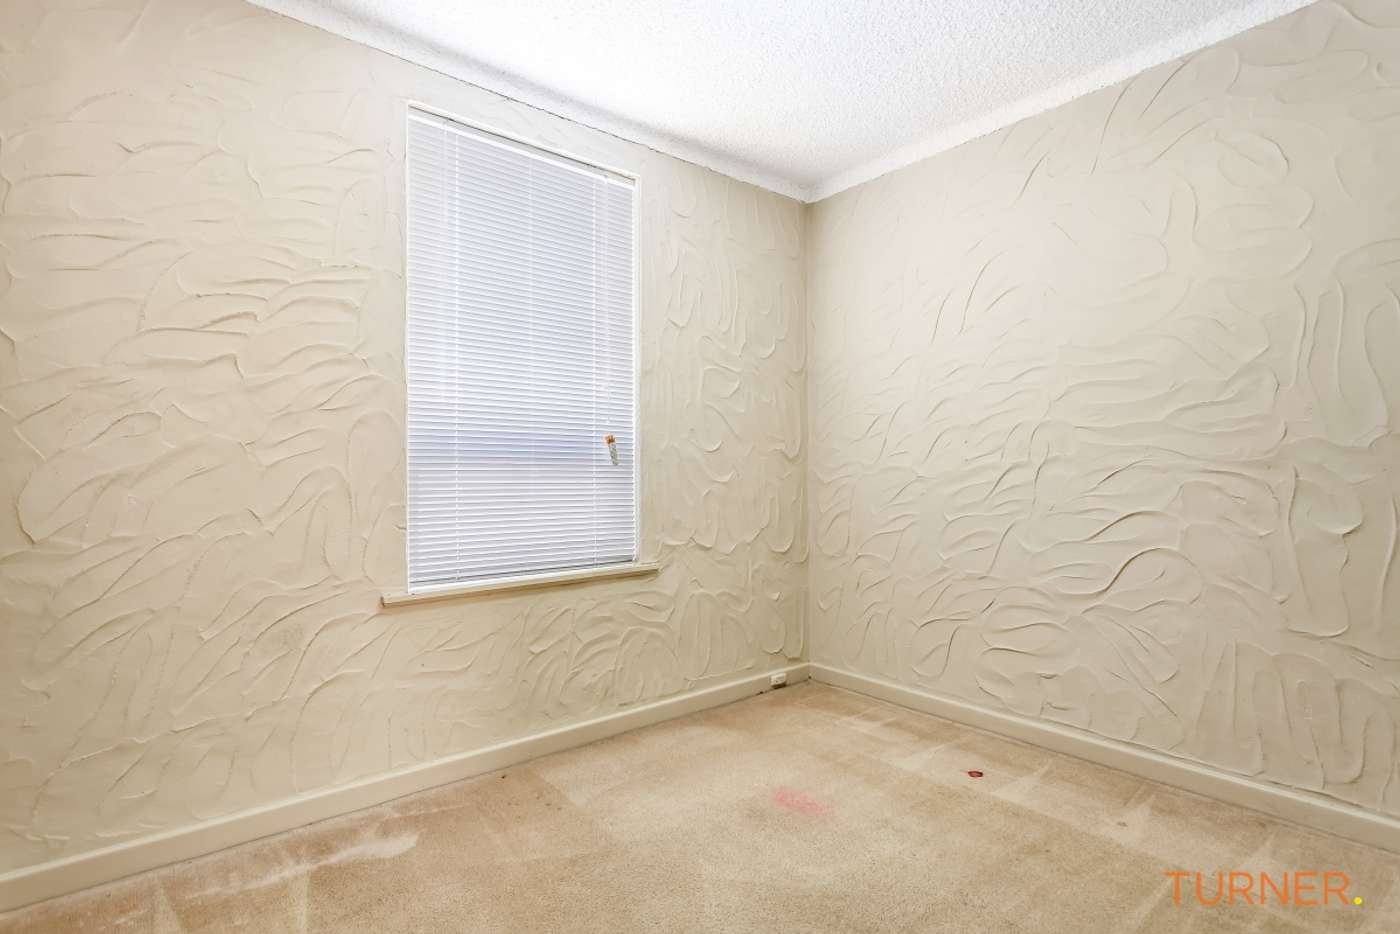 Sixth view of Homely unit listing, 5/35 Nile Street, Glenelg SA 5045